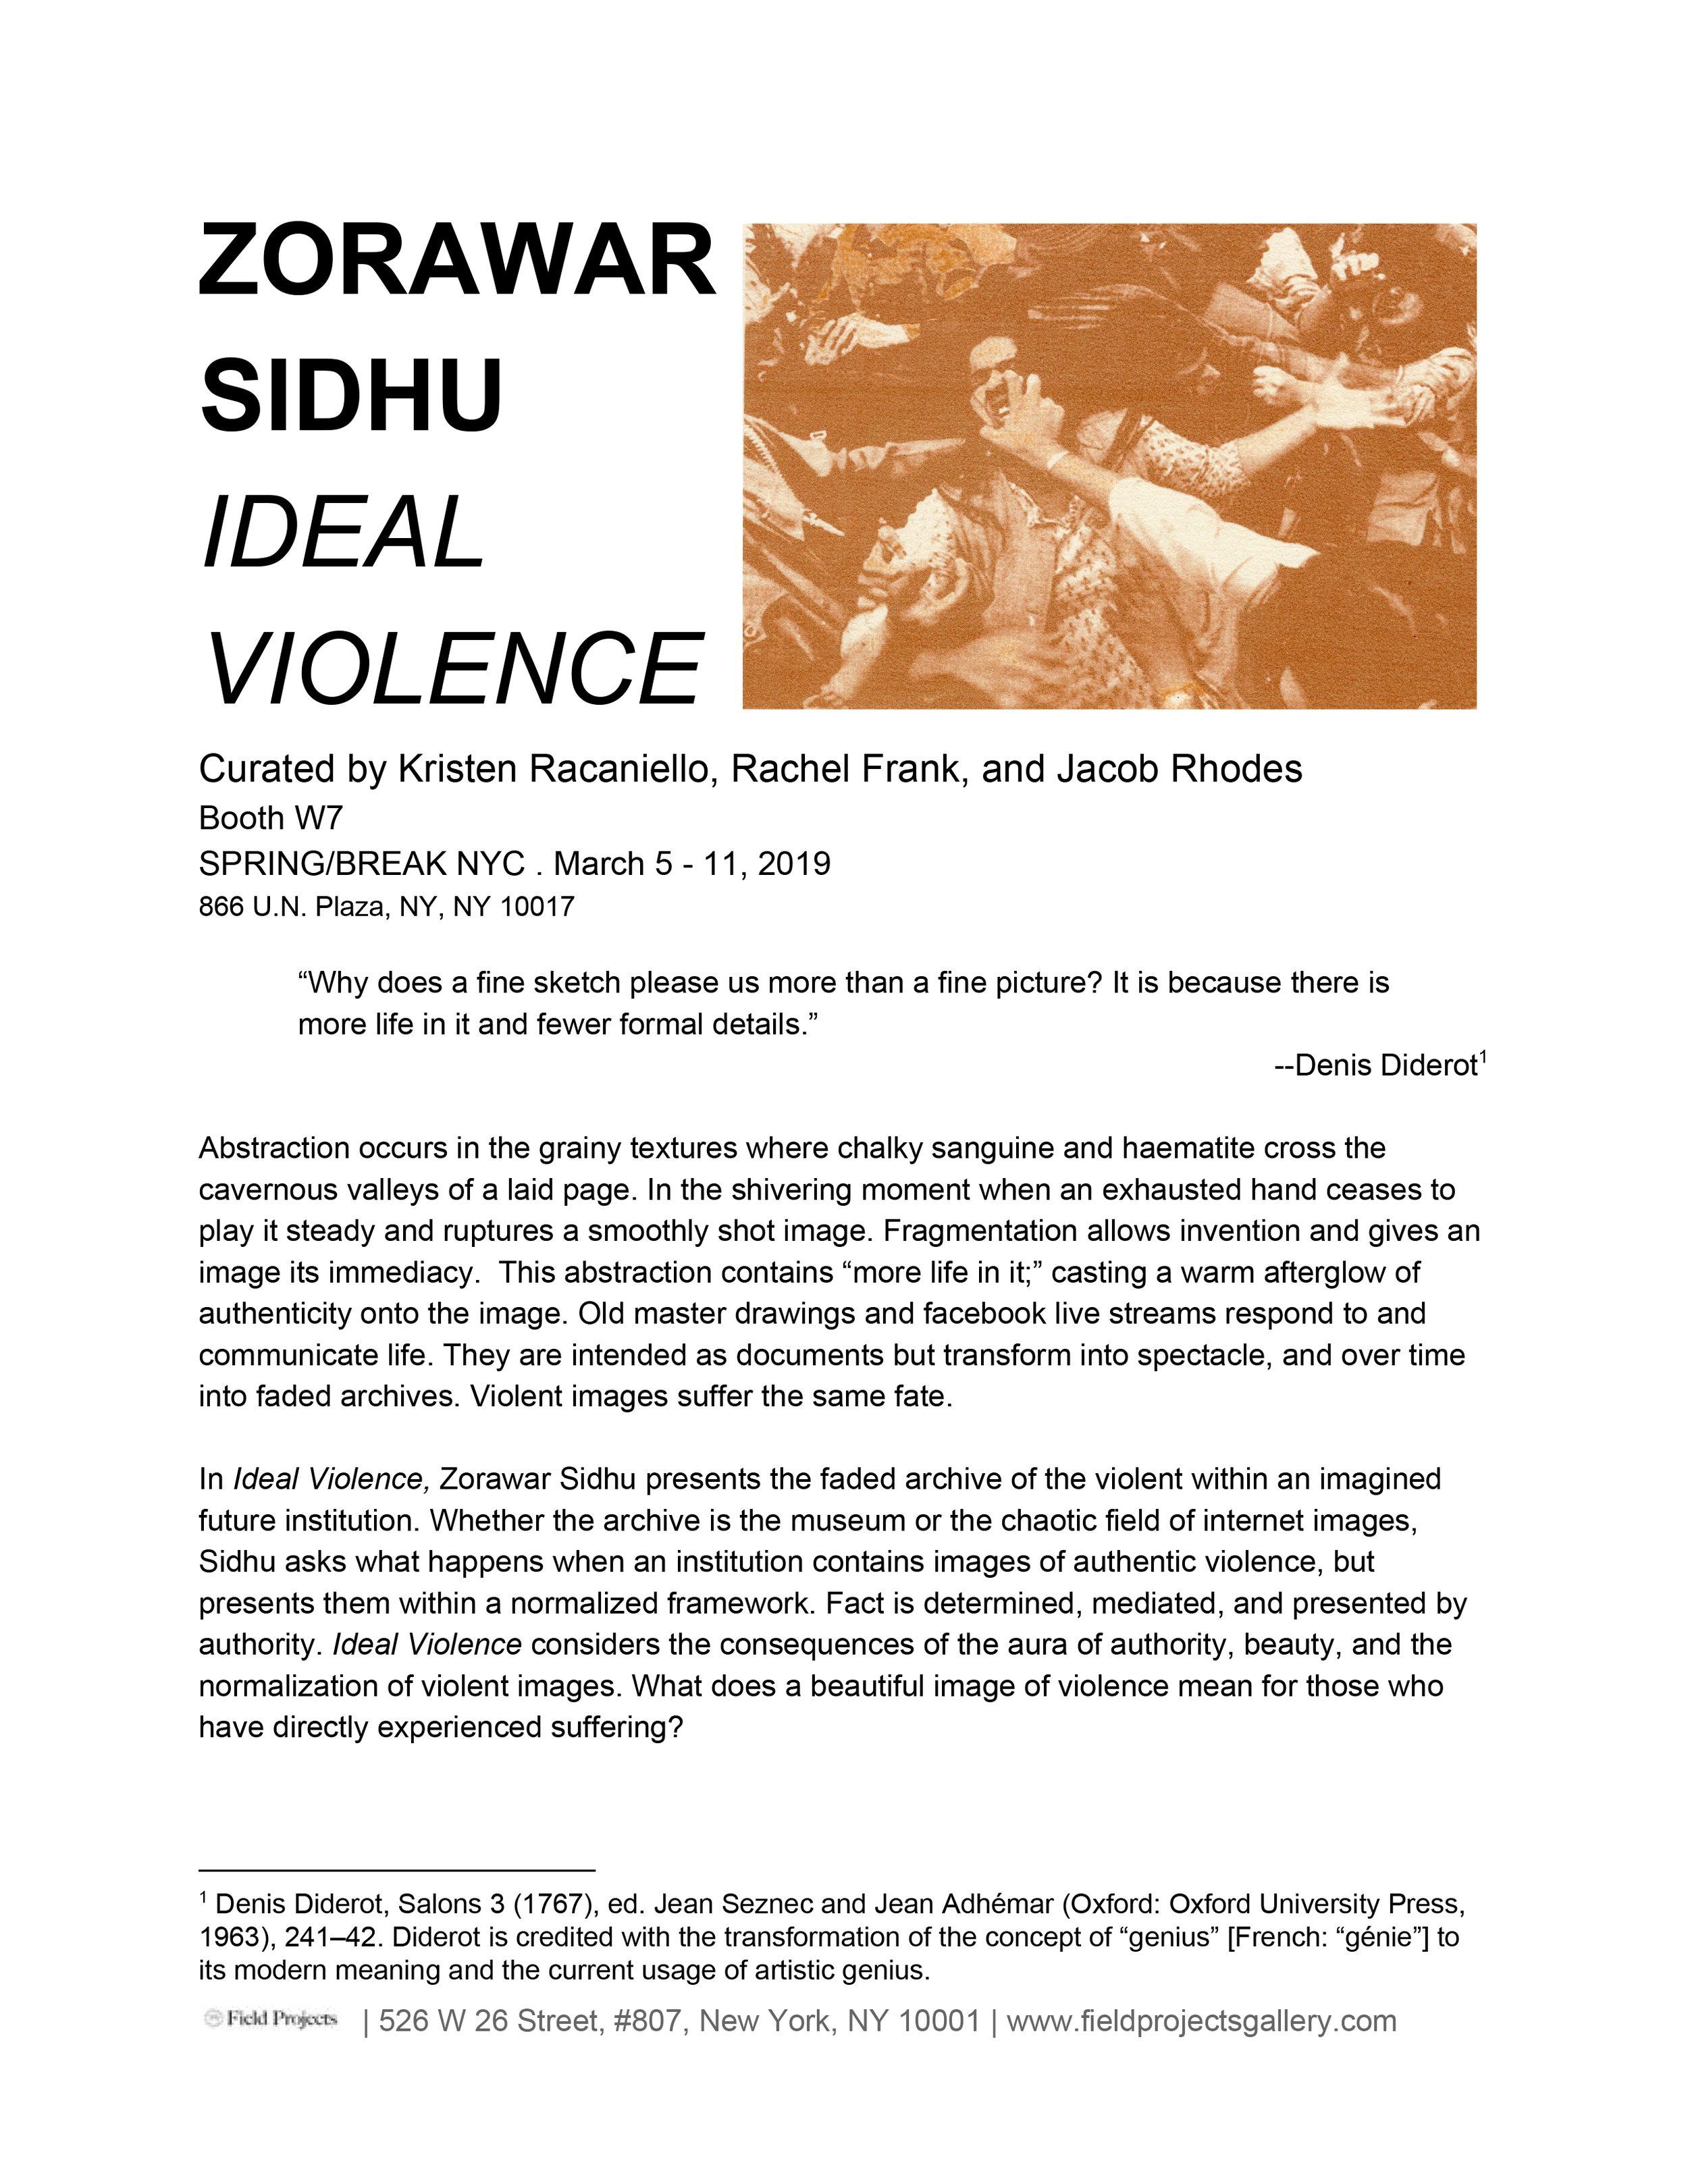 Press release Ideal Violence-1.jpg